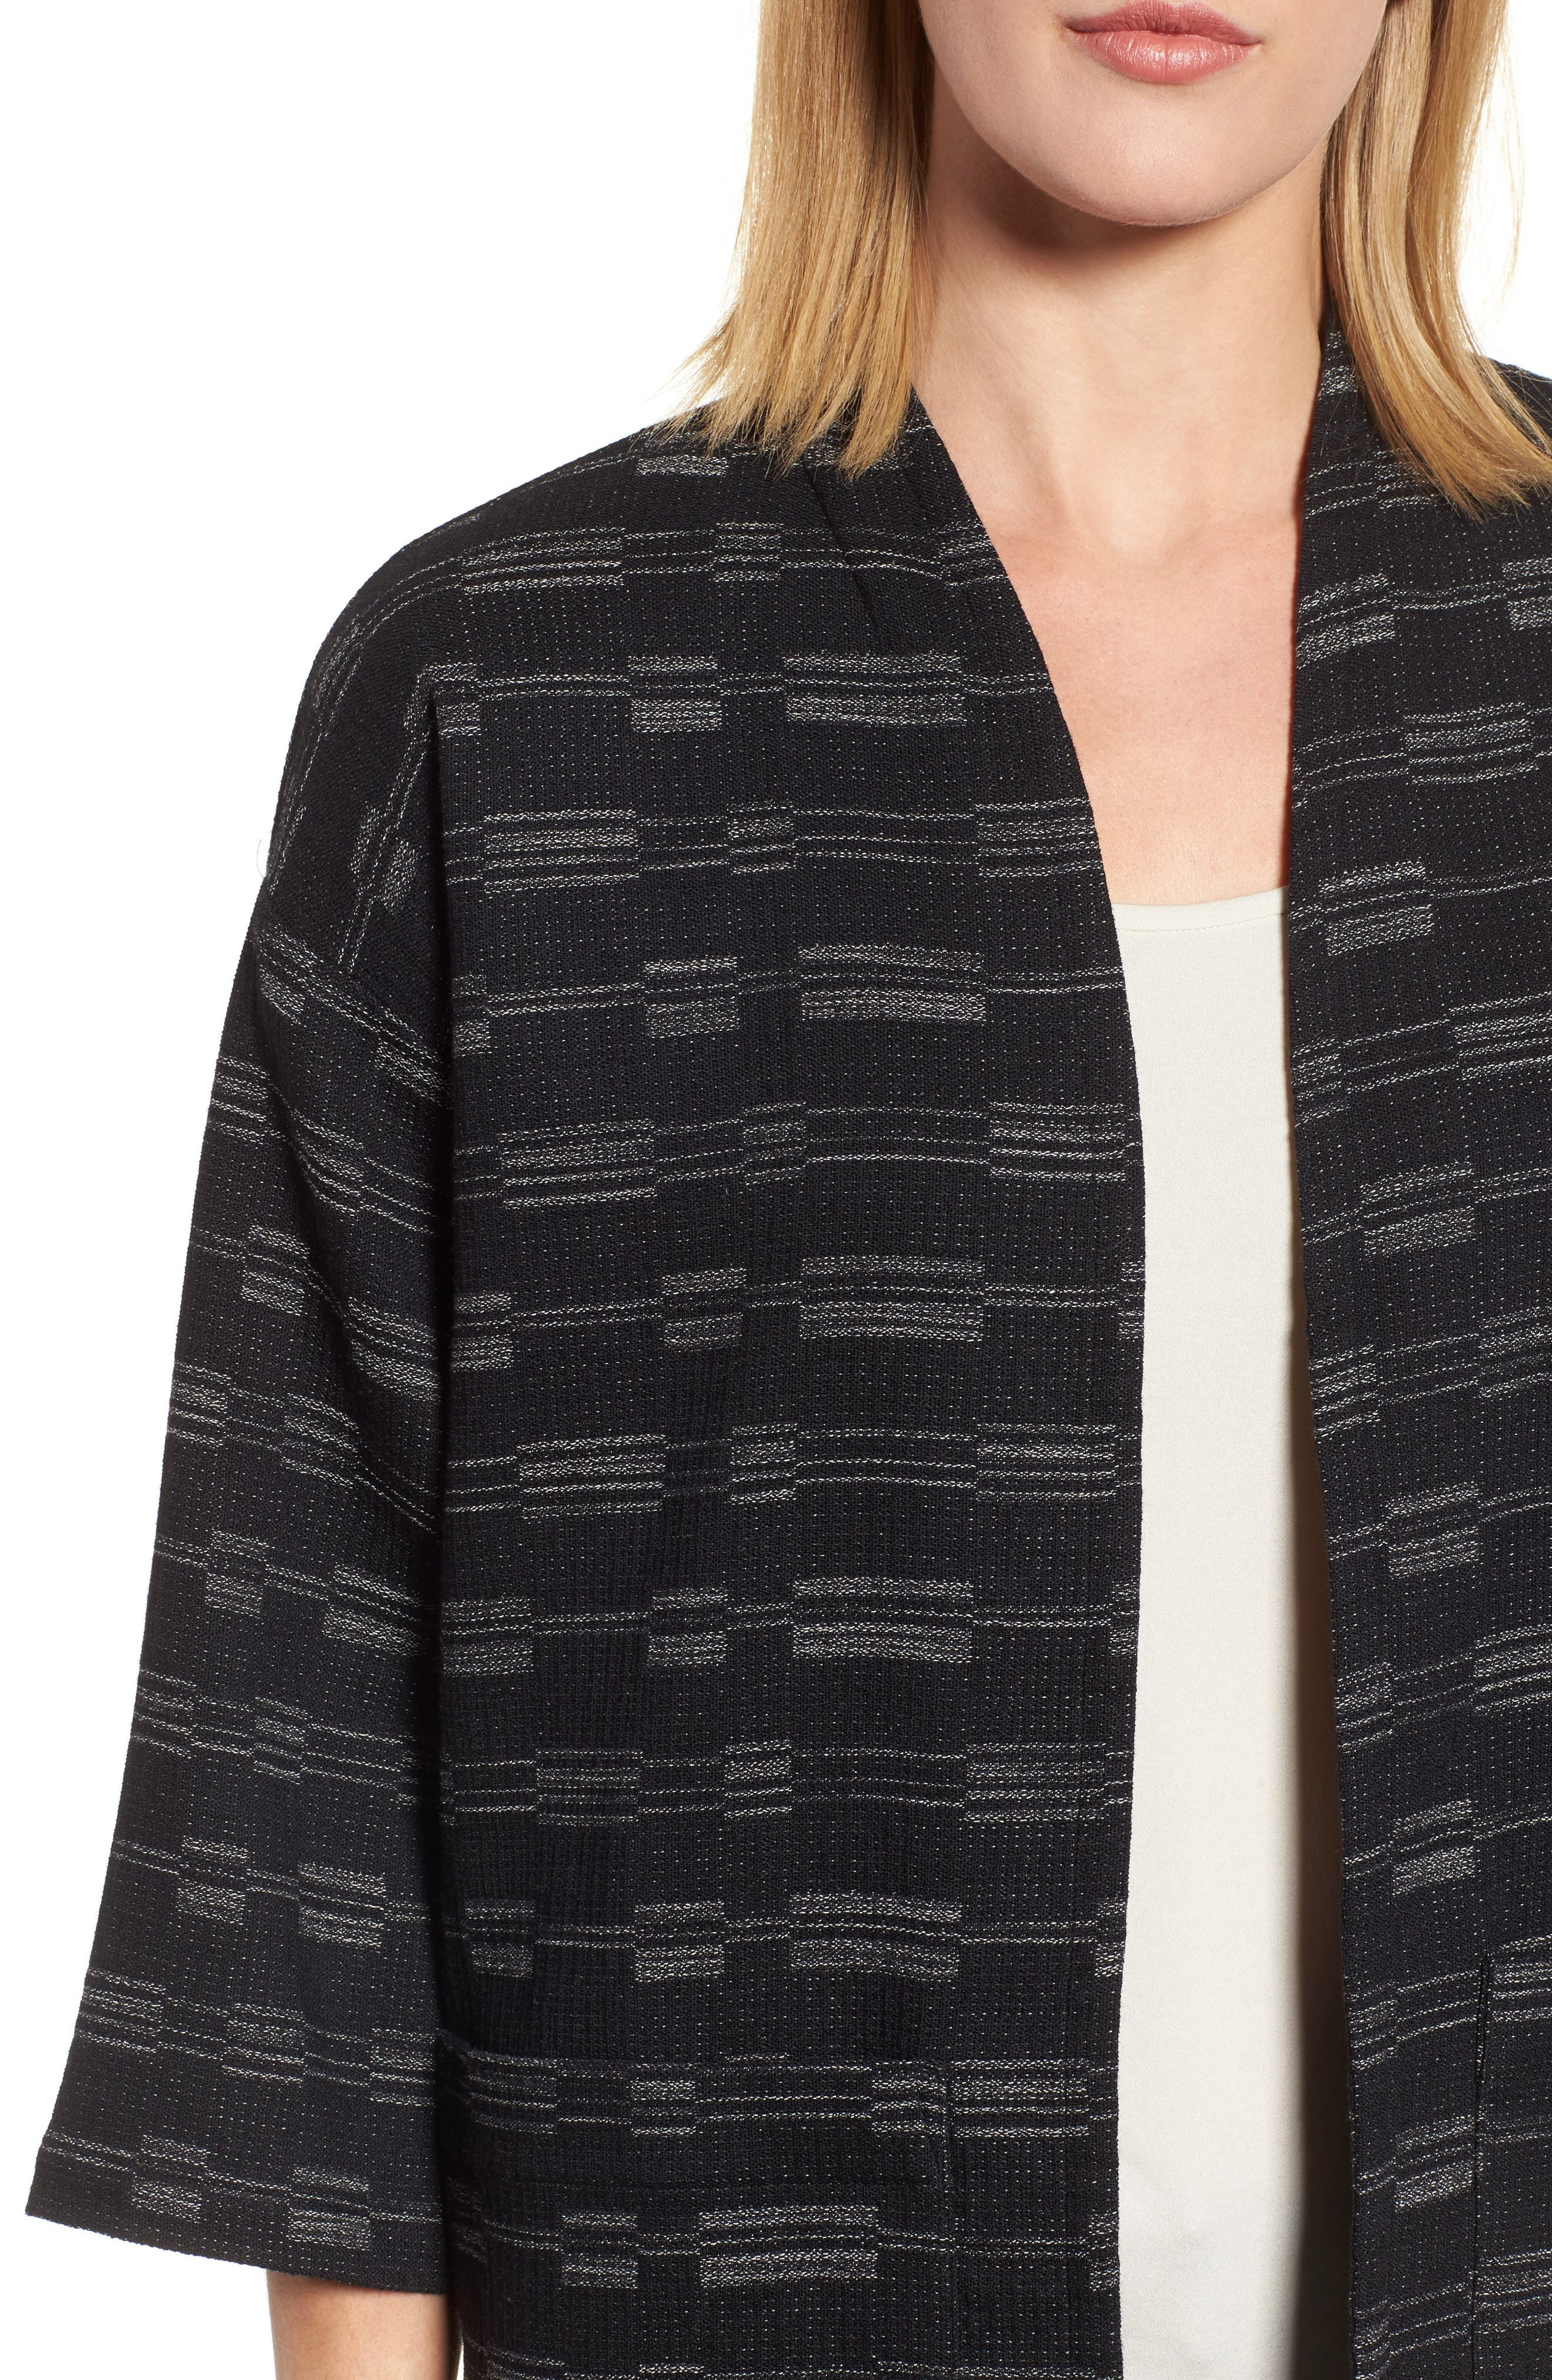 Organic Cotton Blend Tweed Jacket,                             Alternate thumbnail 4, color,                             001